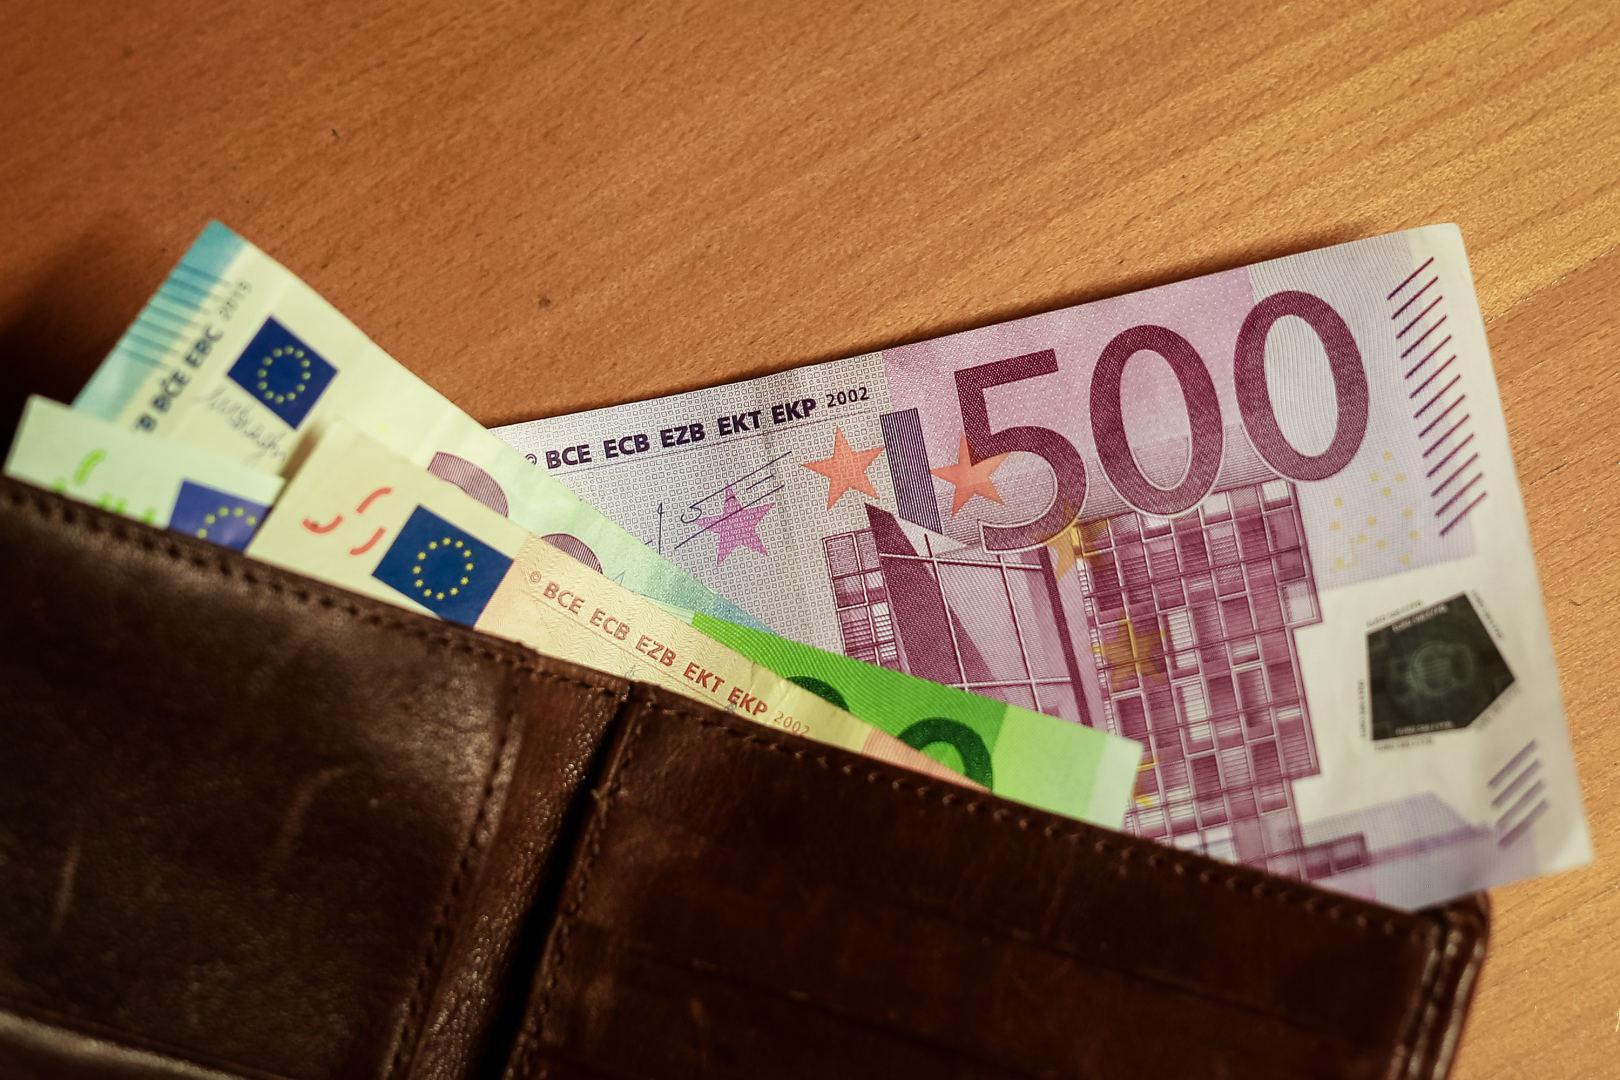 Greiti pinigai internetu | dailesidejos.lt